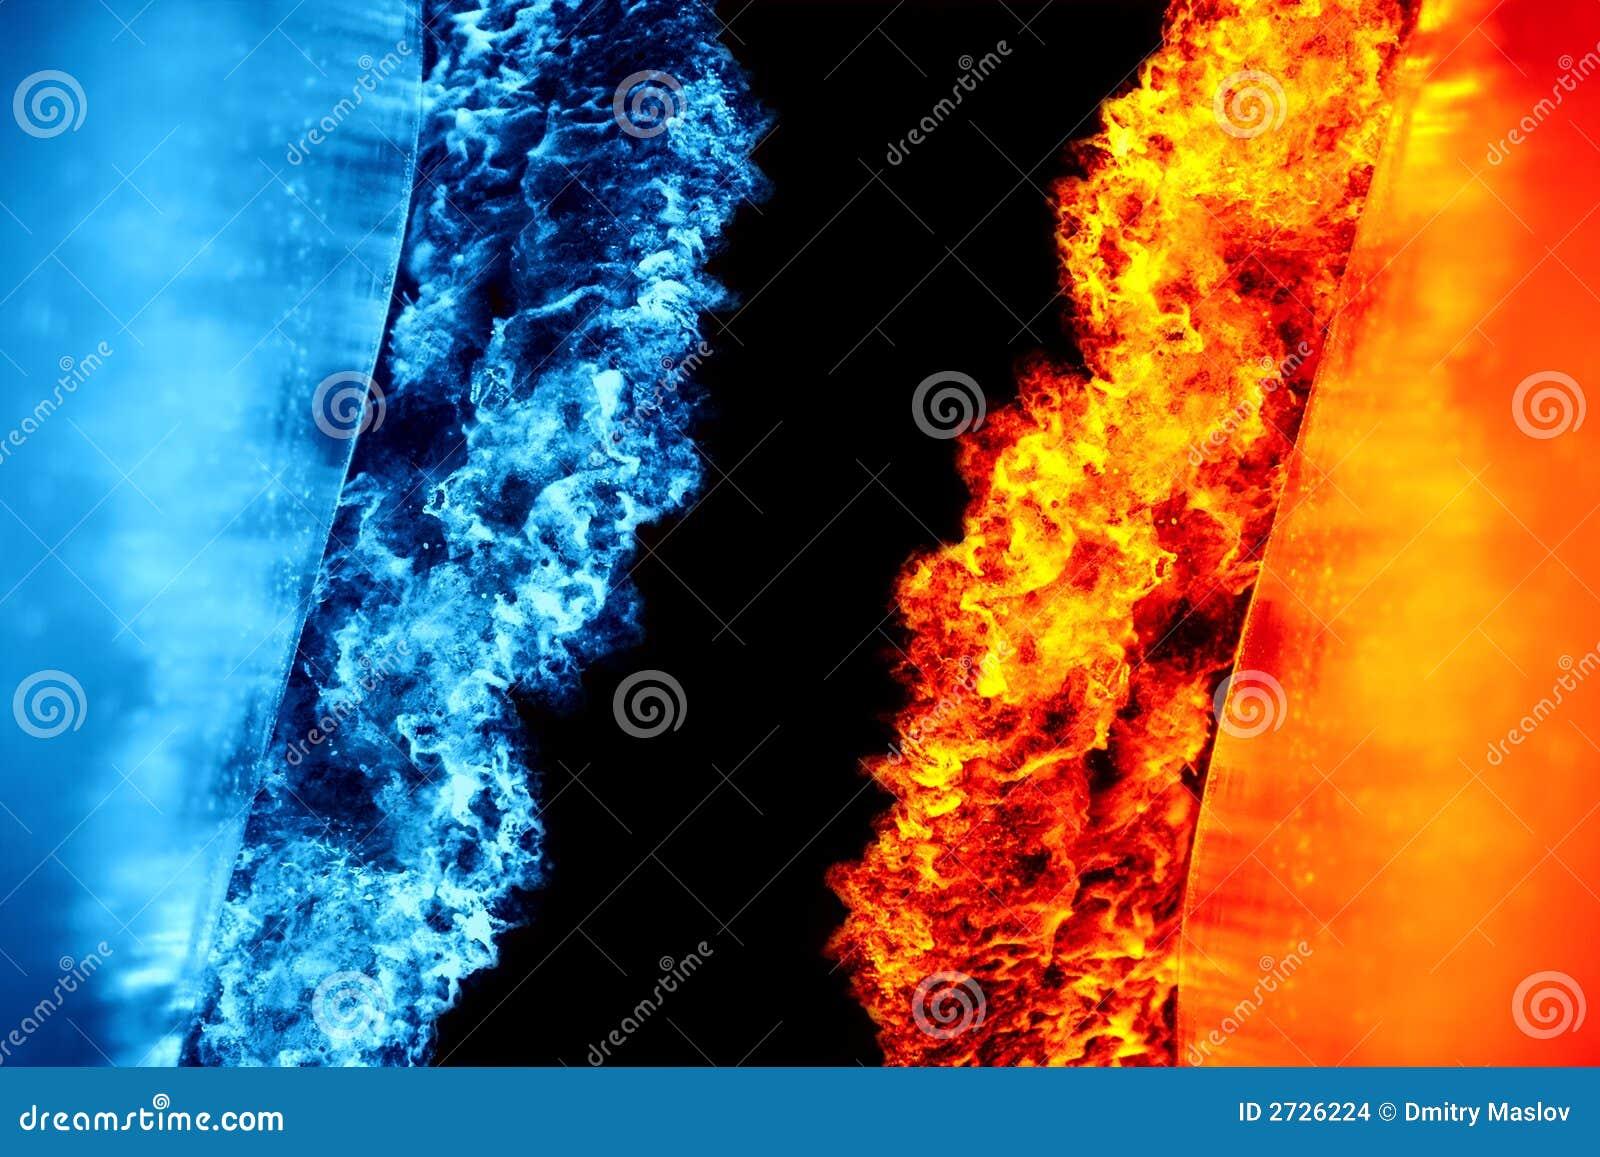 Feuer Gegen Eis